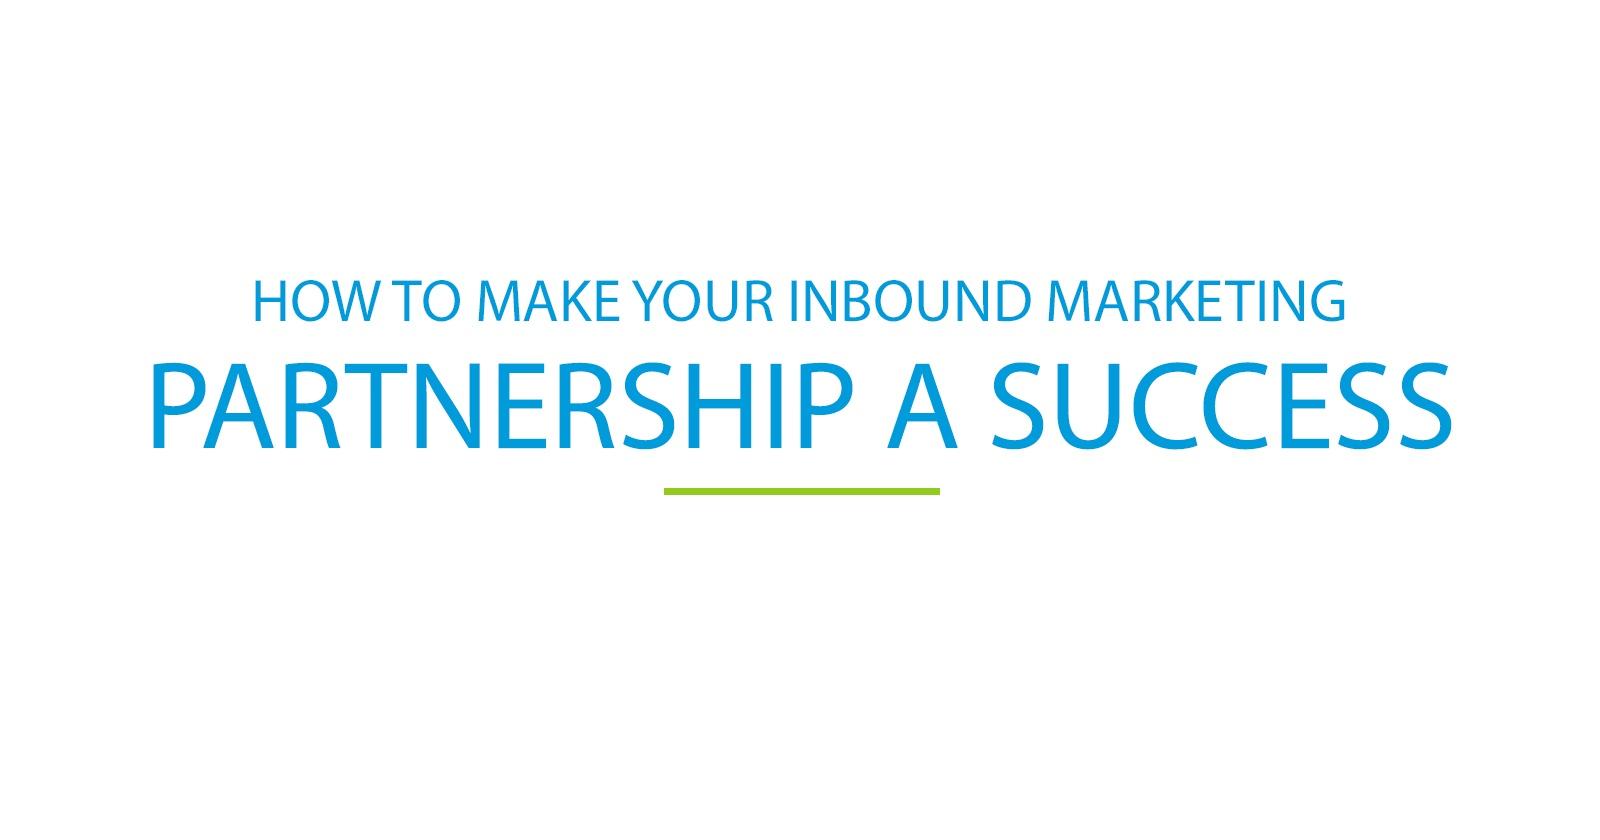 inbound-marketing-partnership-a-success.jpg